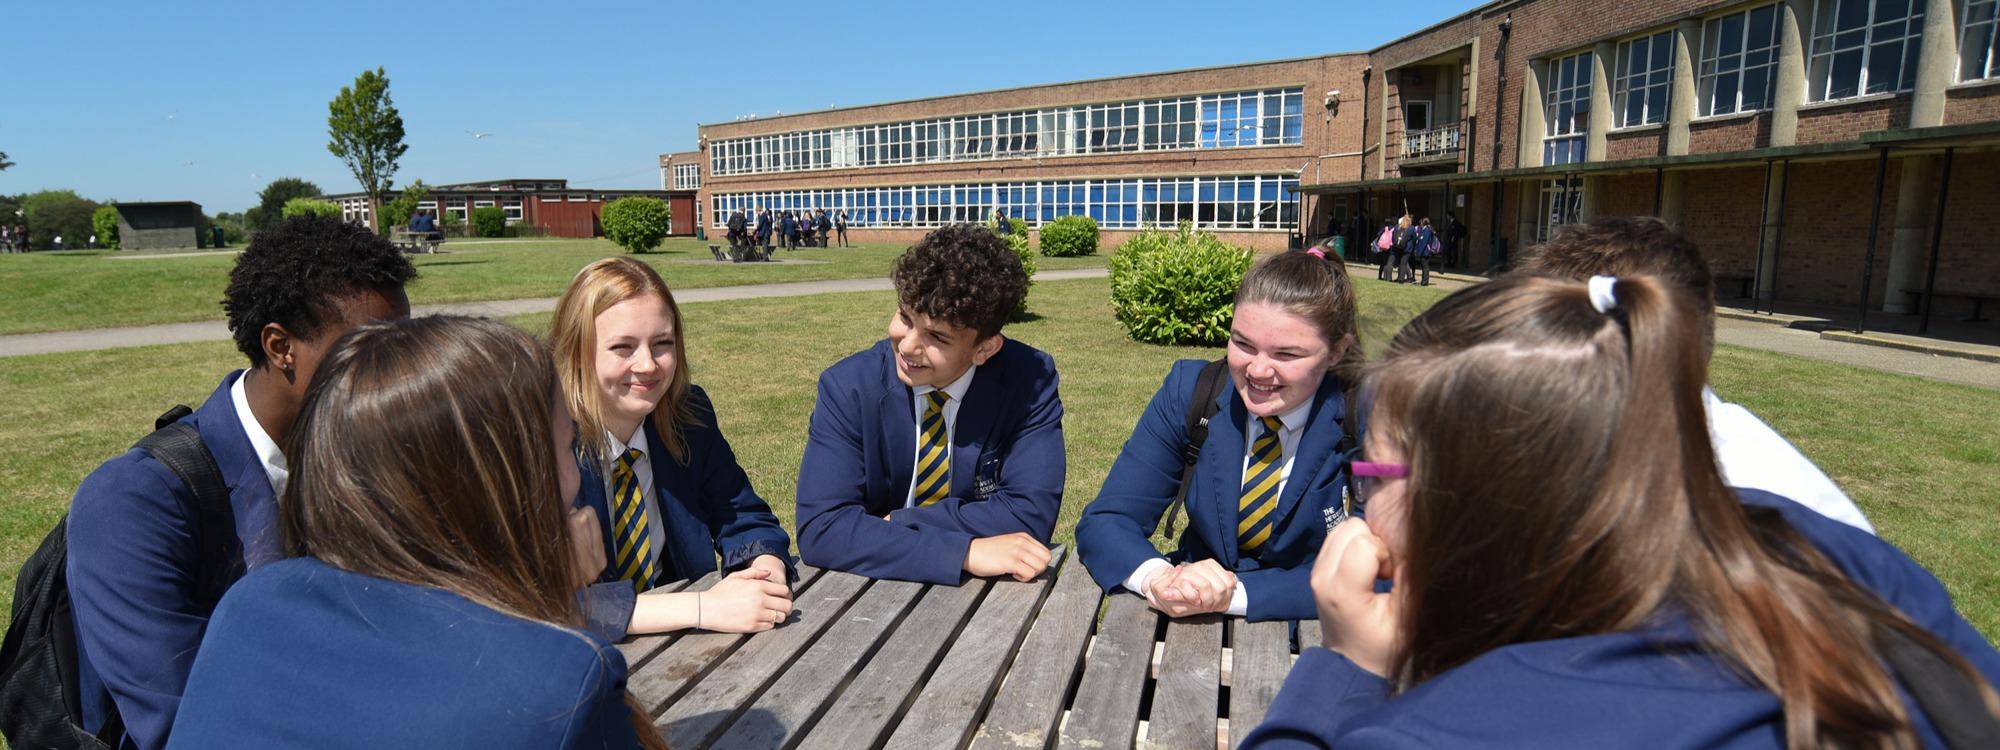 Hewett academy 3